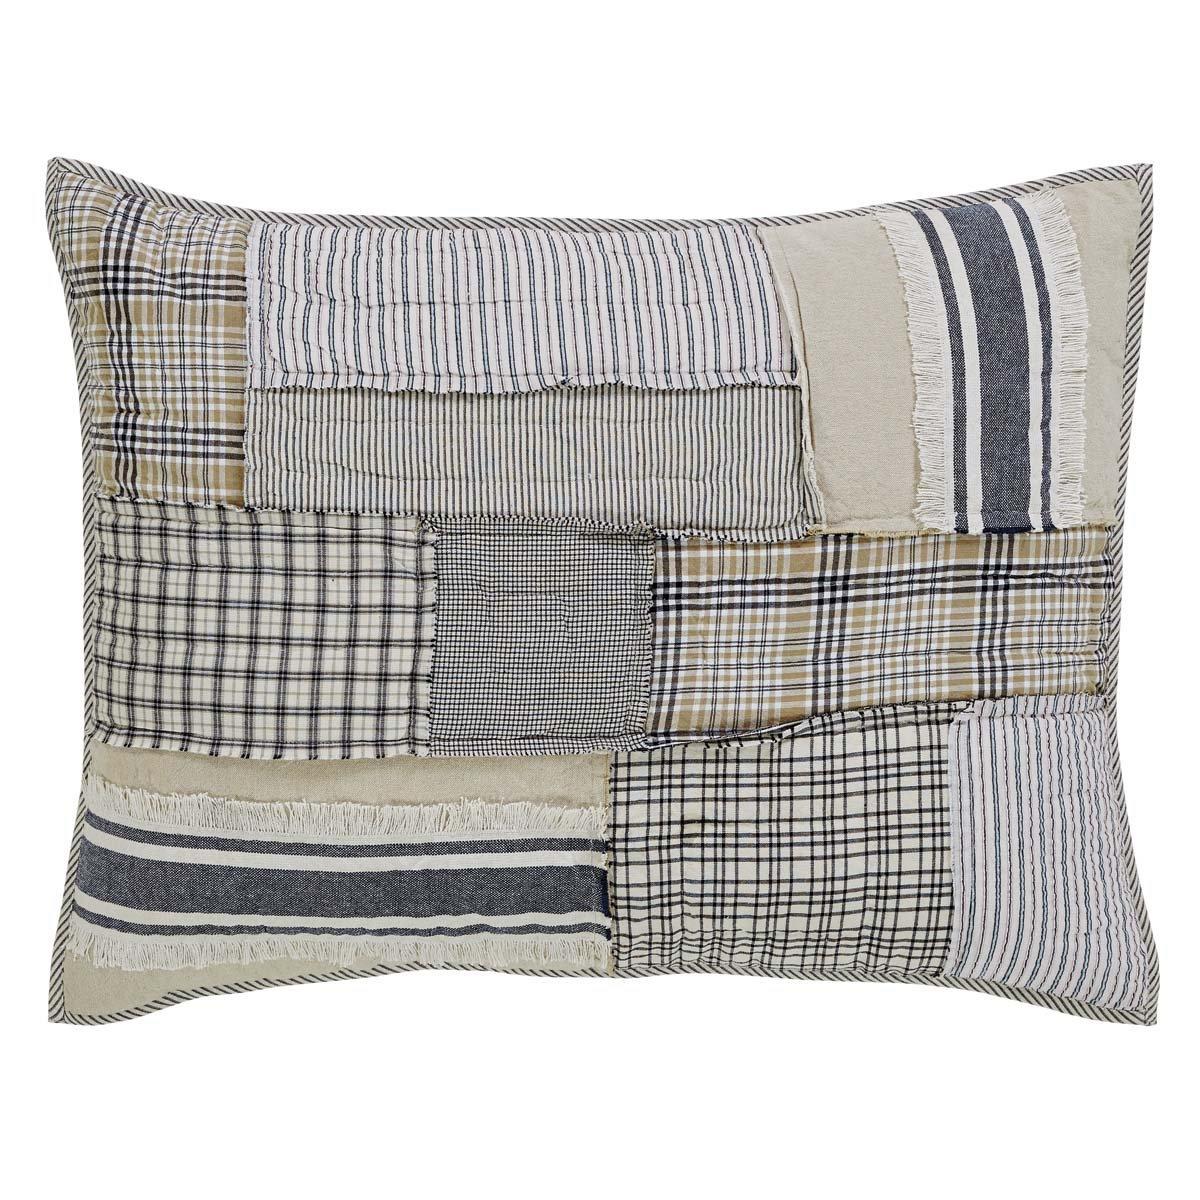 Piper Classics Mill Creek Standard Pillow Sham, 21 x 27, Farmhouse Decor Bed Pillow Cover